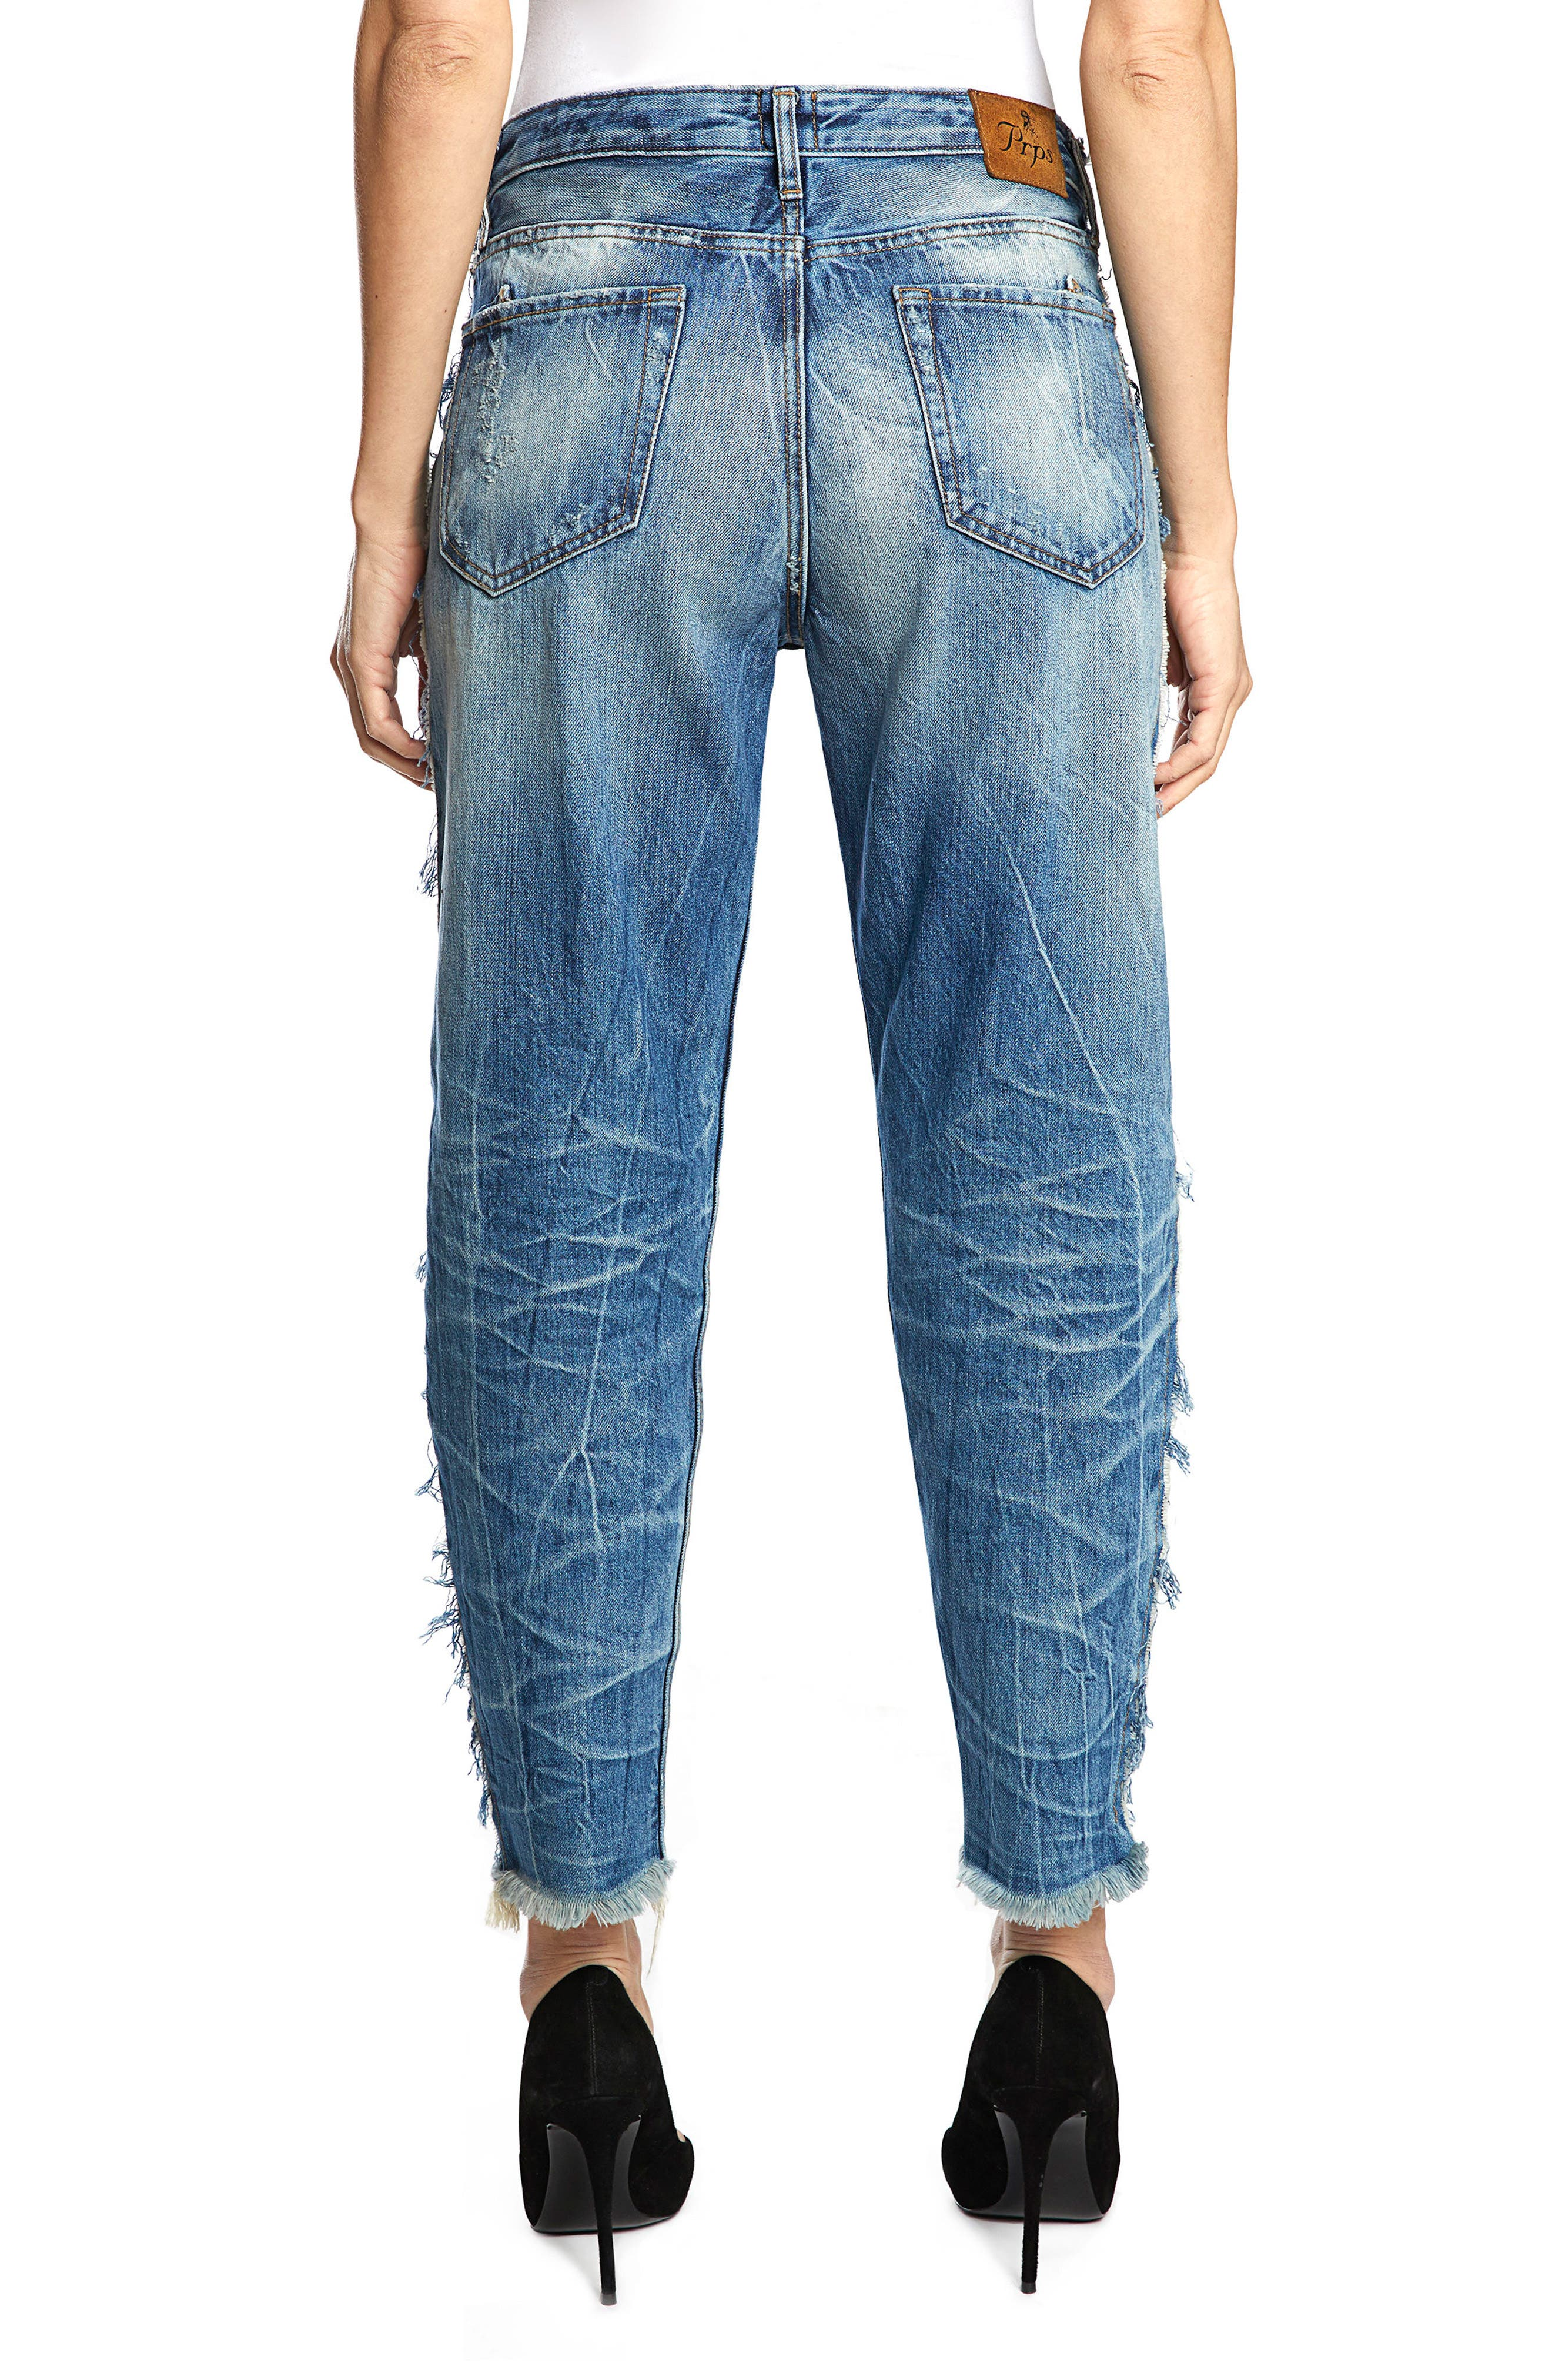 Bel Air High Waist Contrast Seam Boyfriend Jeans,                             Alternate thumbnail 2, color,                             490